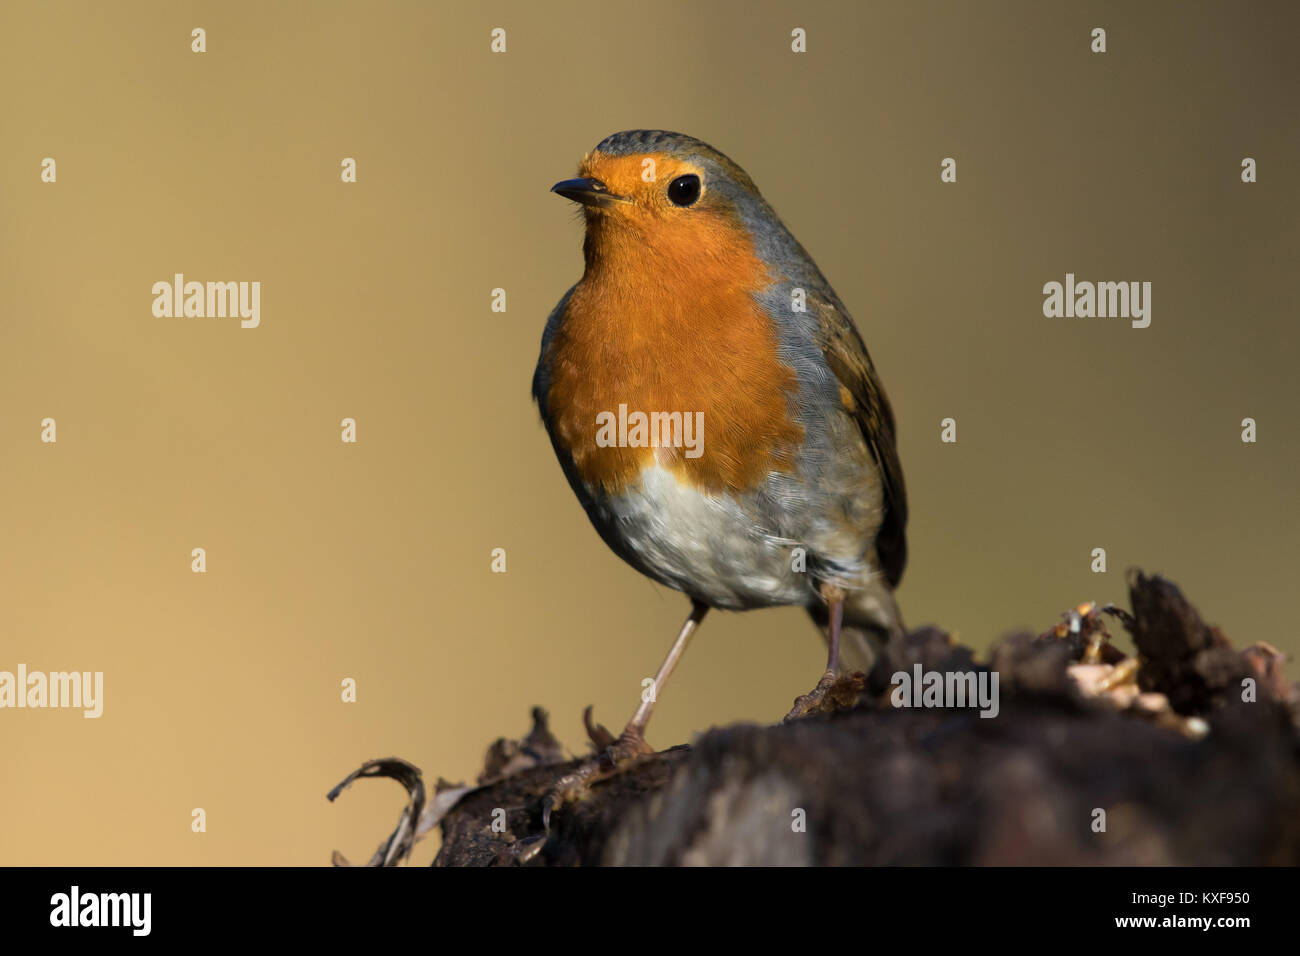 European Robin (Erithacus rubecula) - Stock Image